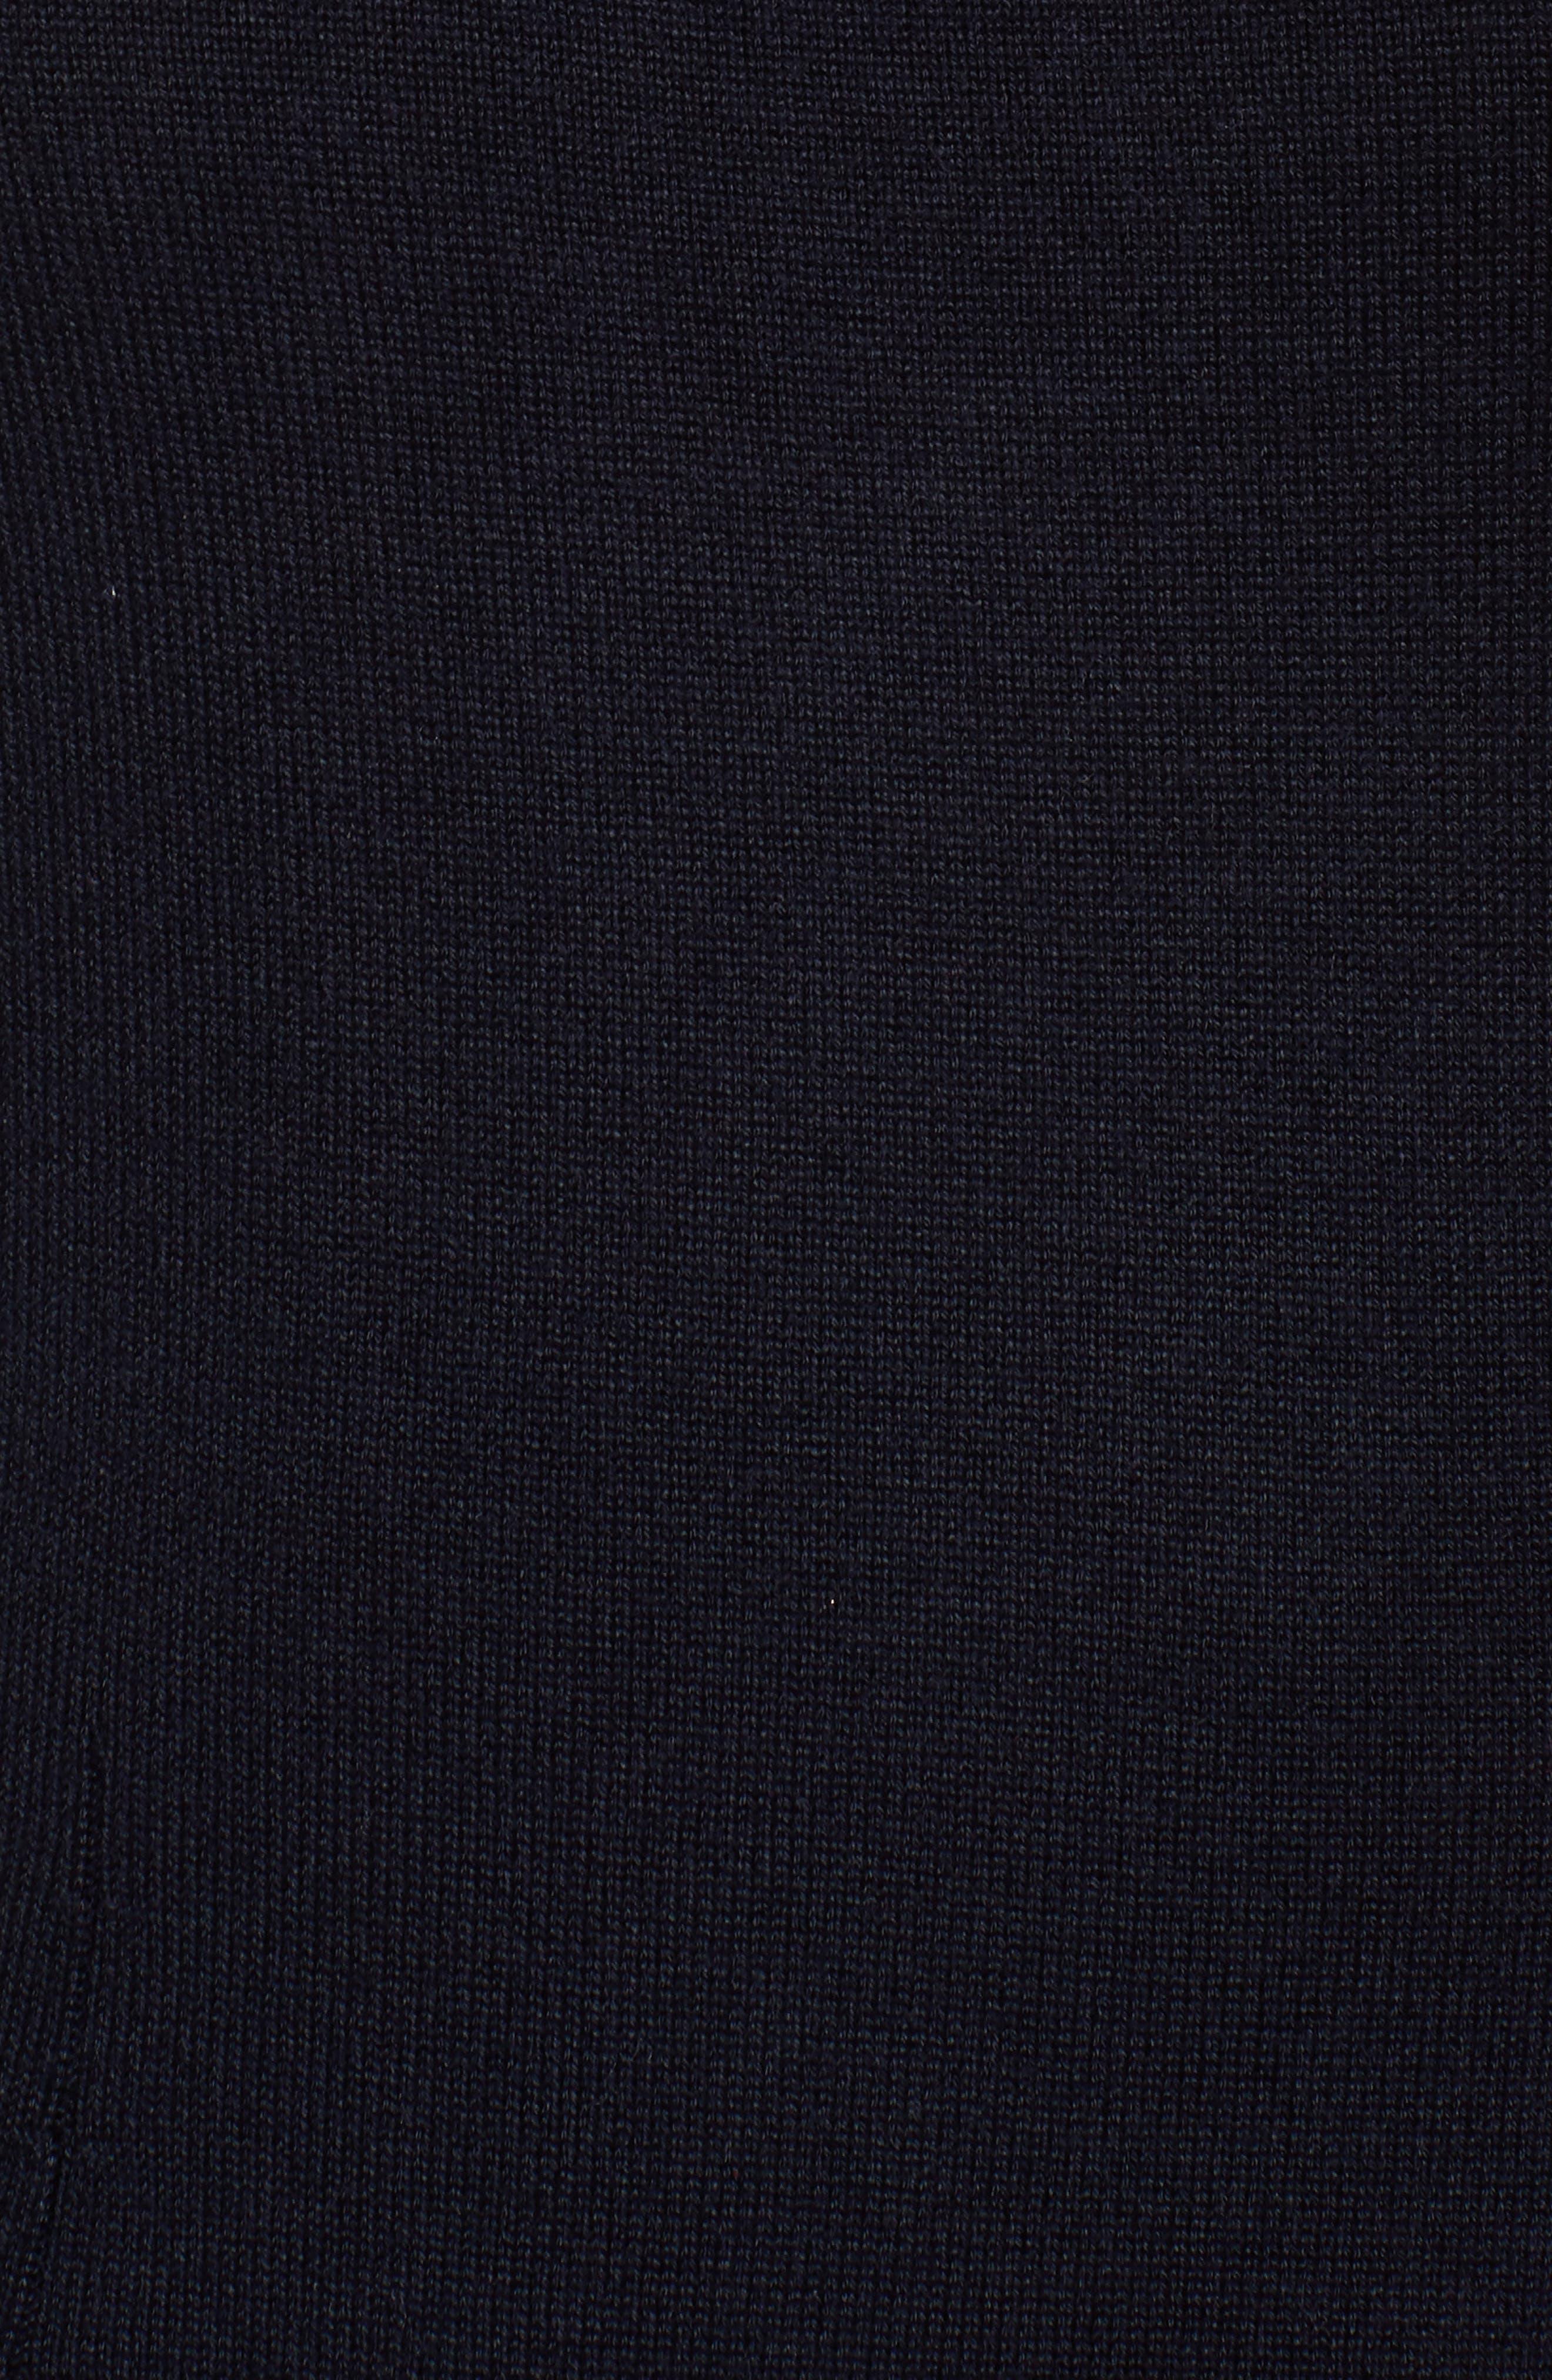 Stripe Knit Flared Dress,                             Alternate thumbnail 5, color,                             Ivory/ Navy